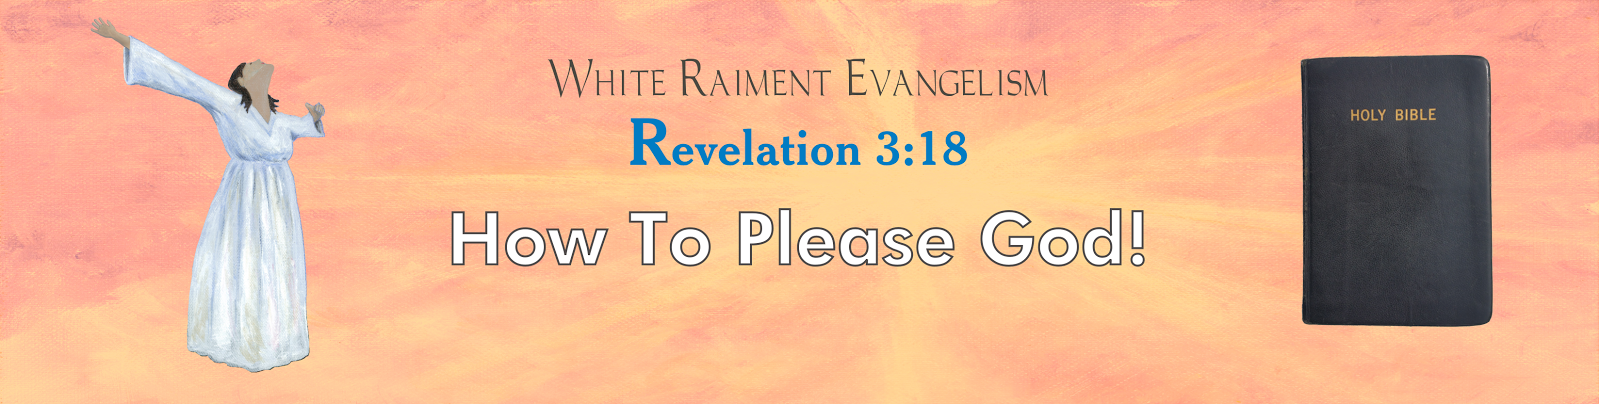 White Raiment Evangelism: How To Please God